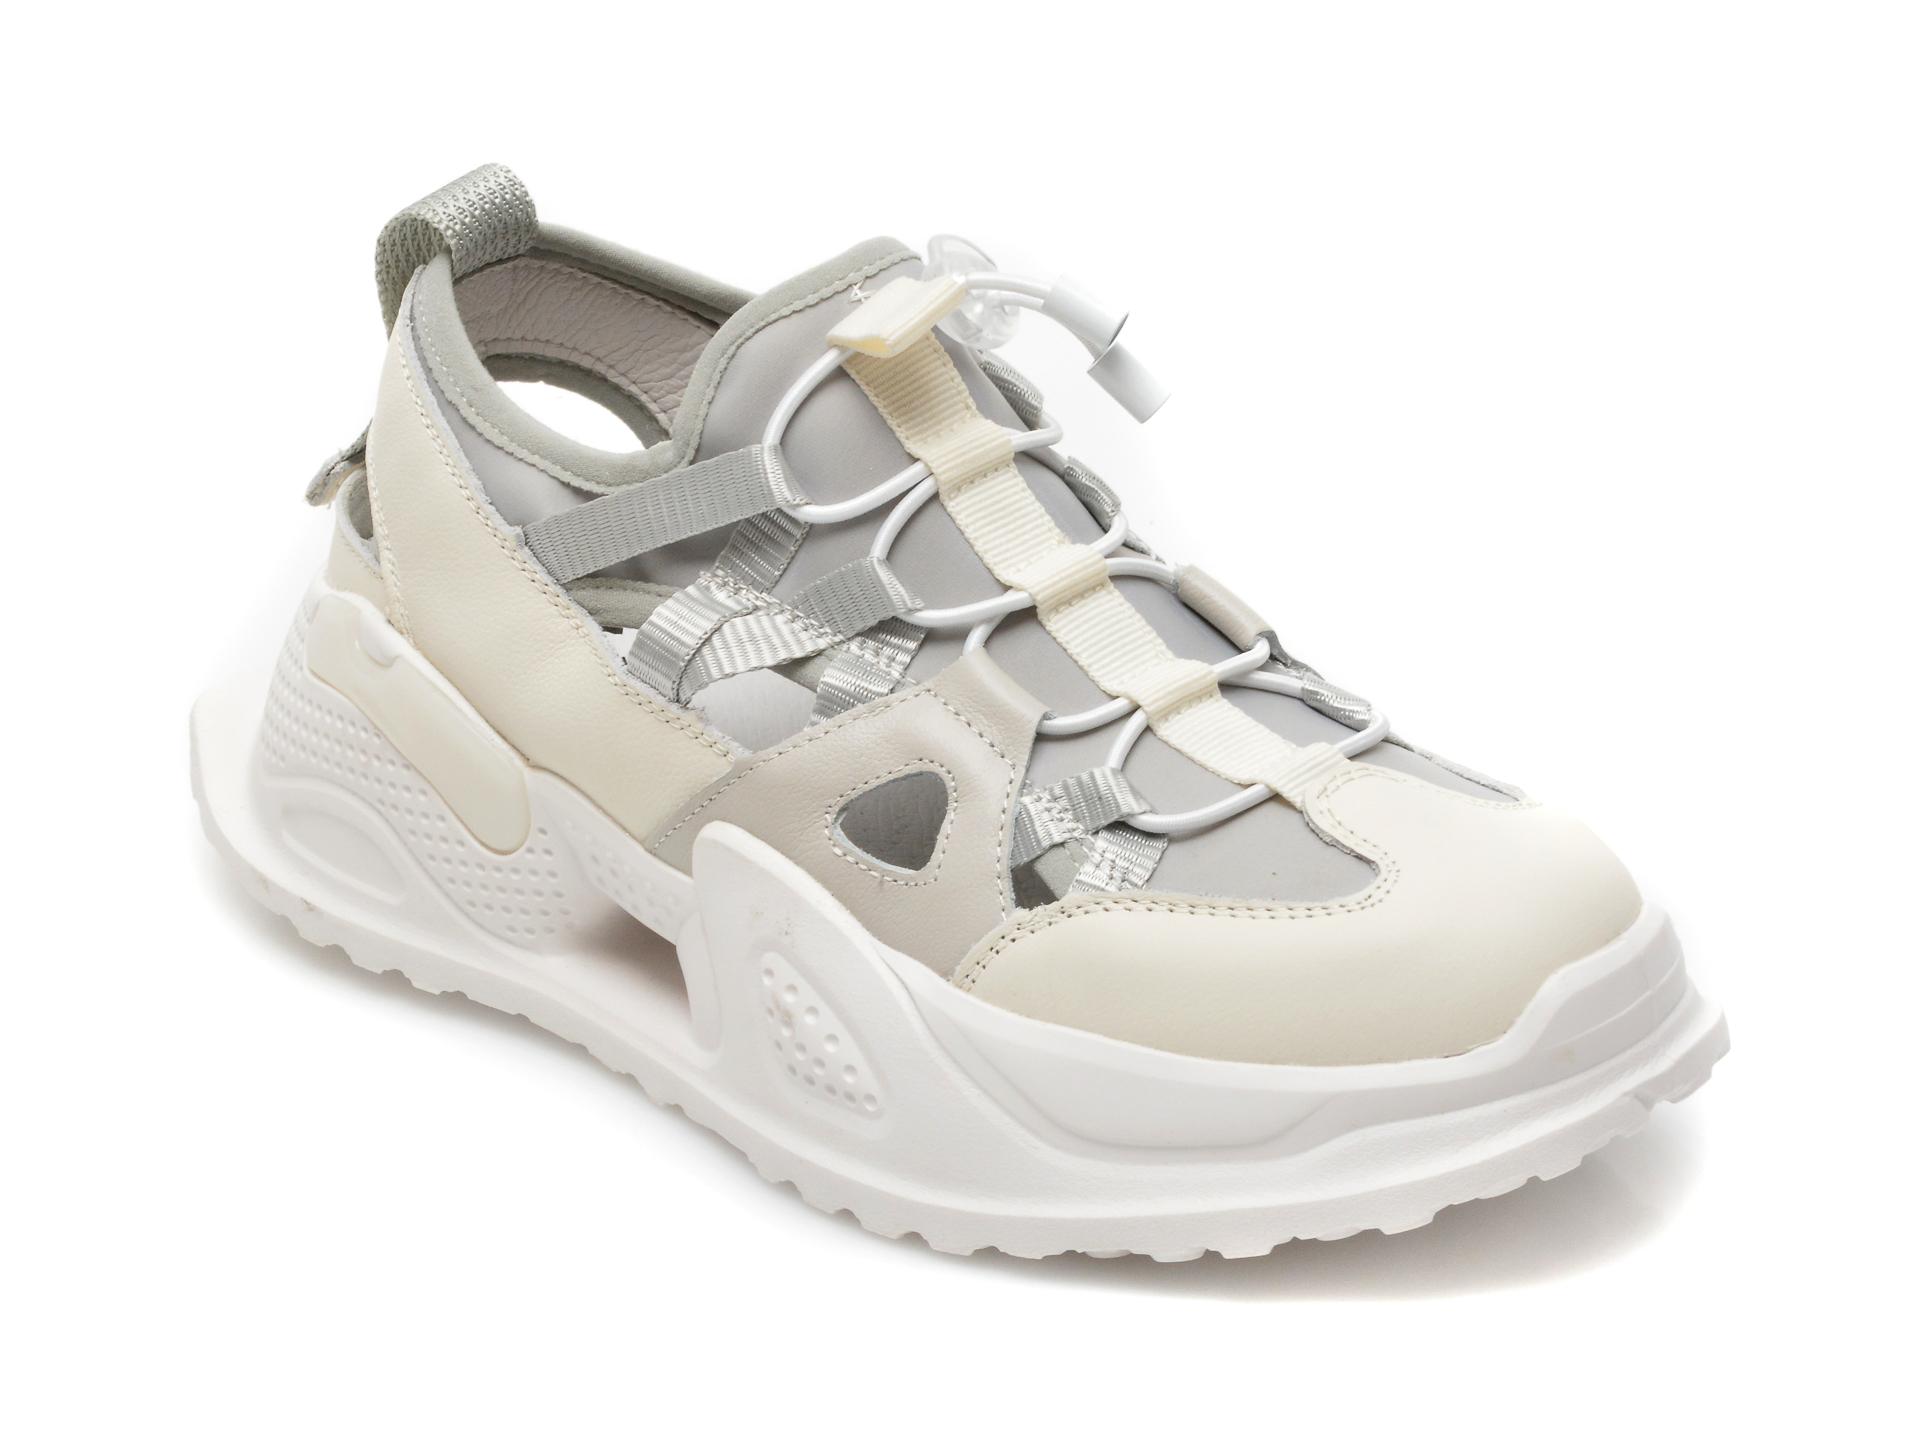 Pantofi sport GRYXX gri, B3171, din material textil si piele naturala imagine 2021 Gryxx